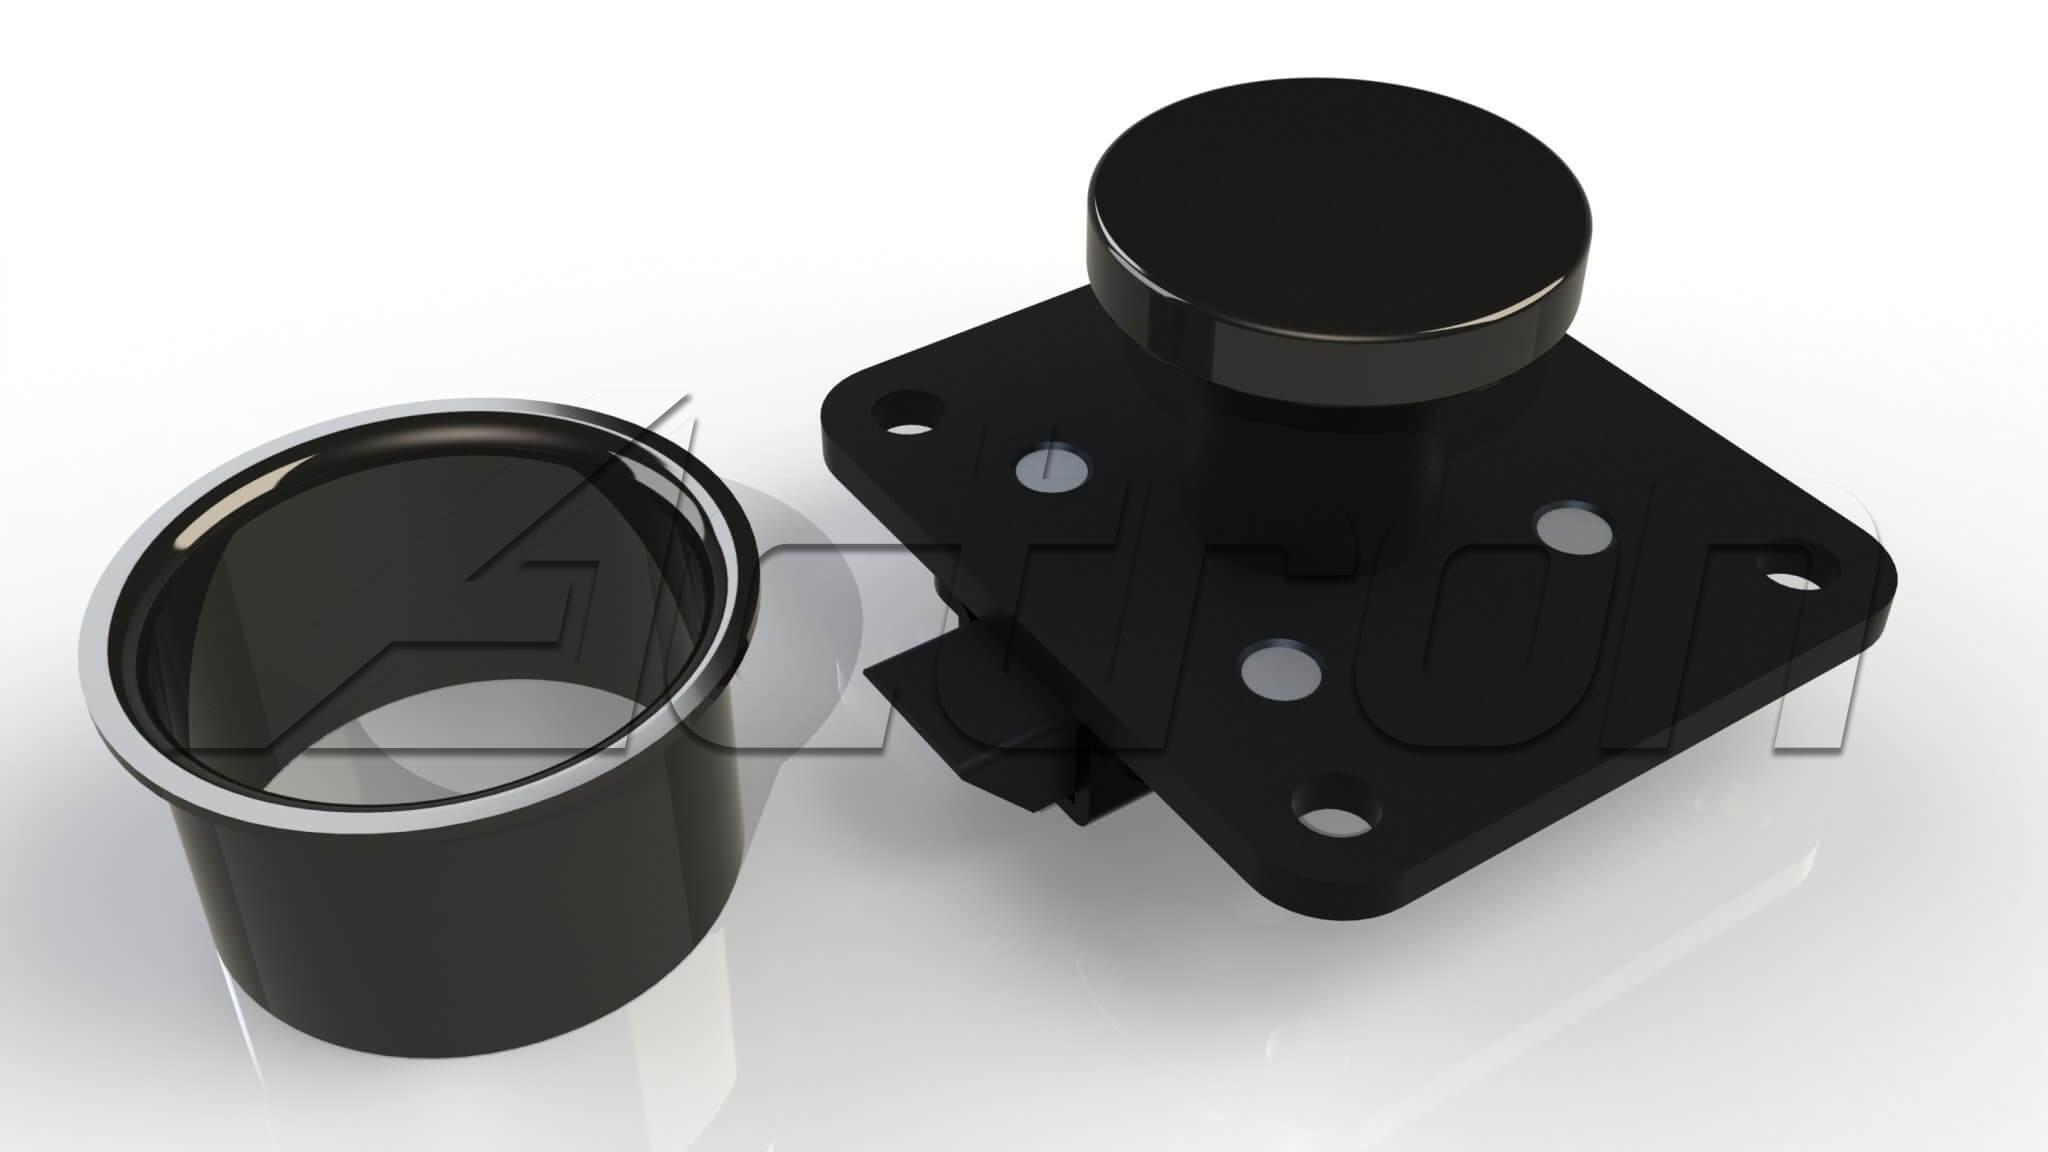 latch-assy-8211-push-button-3967-a30019.jpg